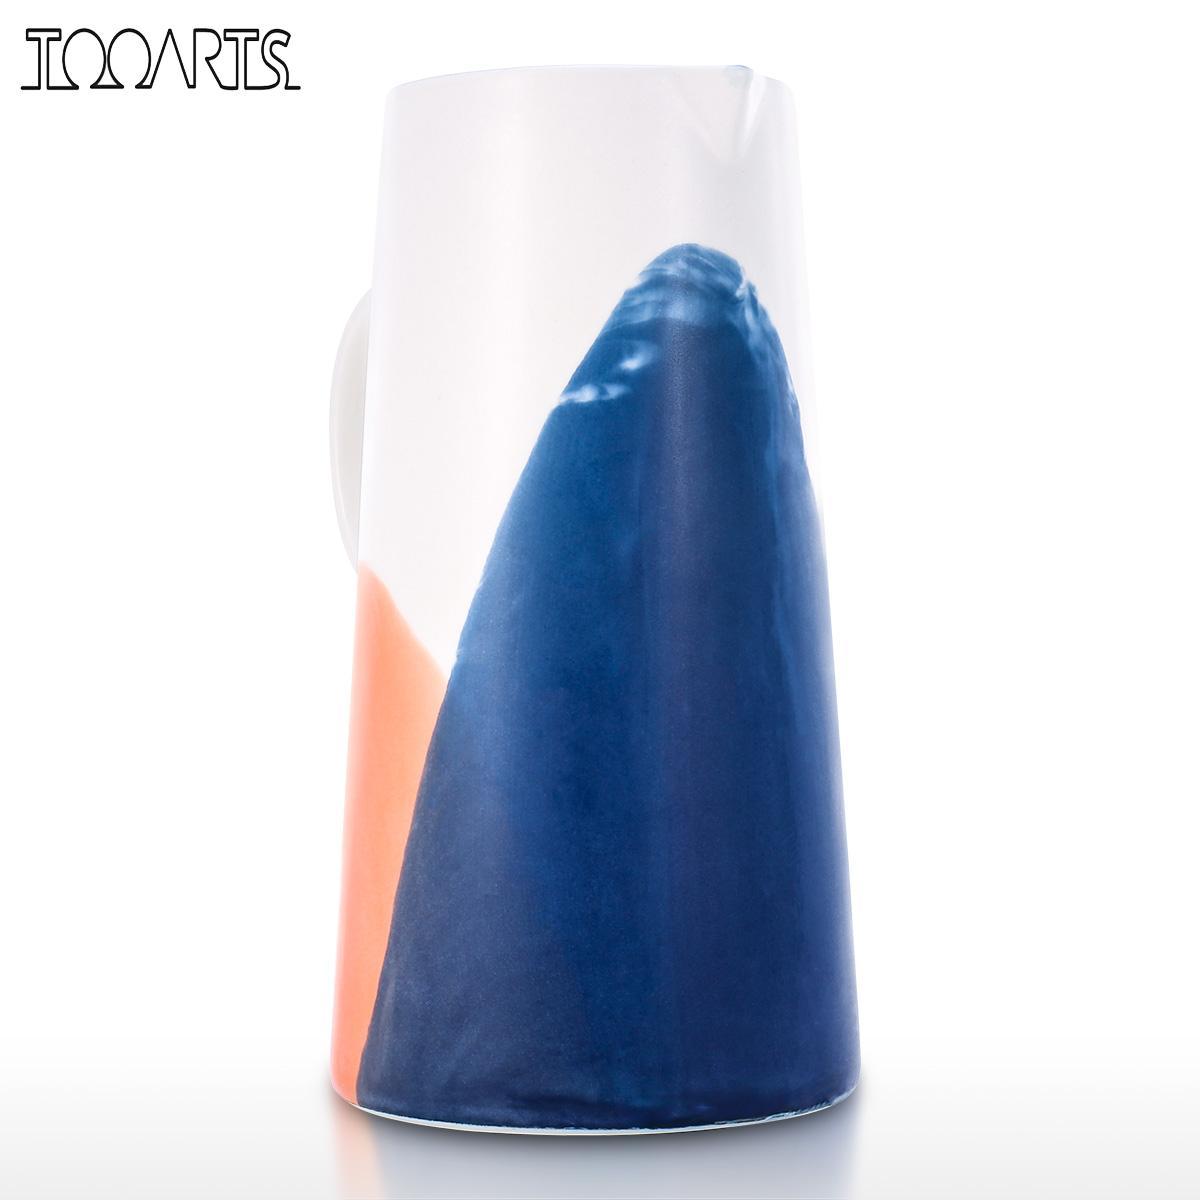 milk pitcher Ceramic Pitcher Decorative Use Ideal Gifts for Home Weddings Milk Jug Pot Espresso Coffee Creamer Pourer